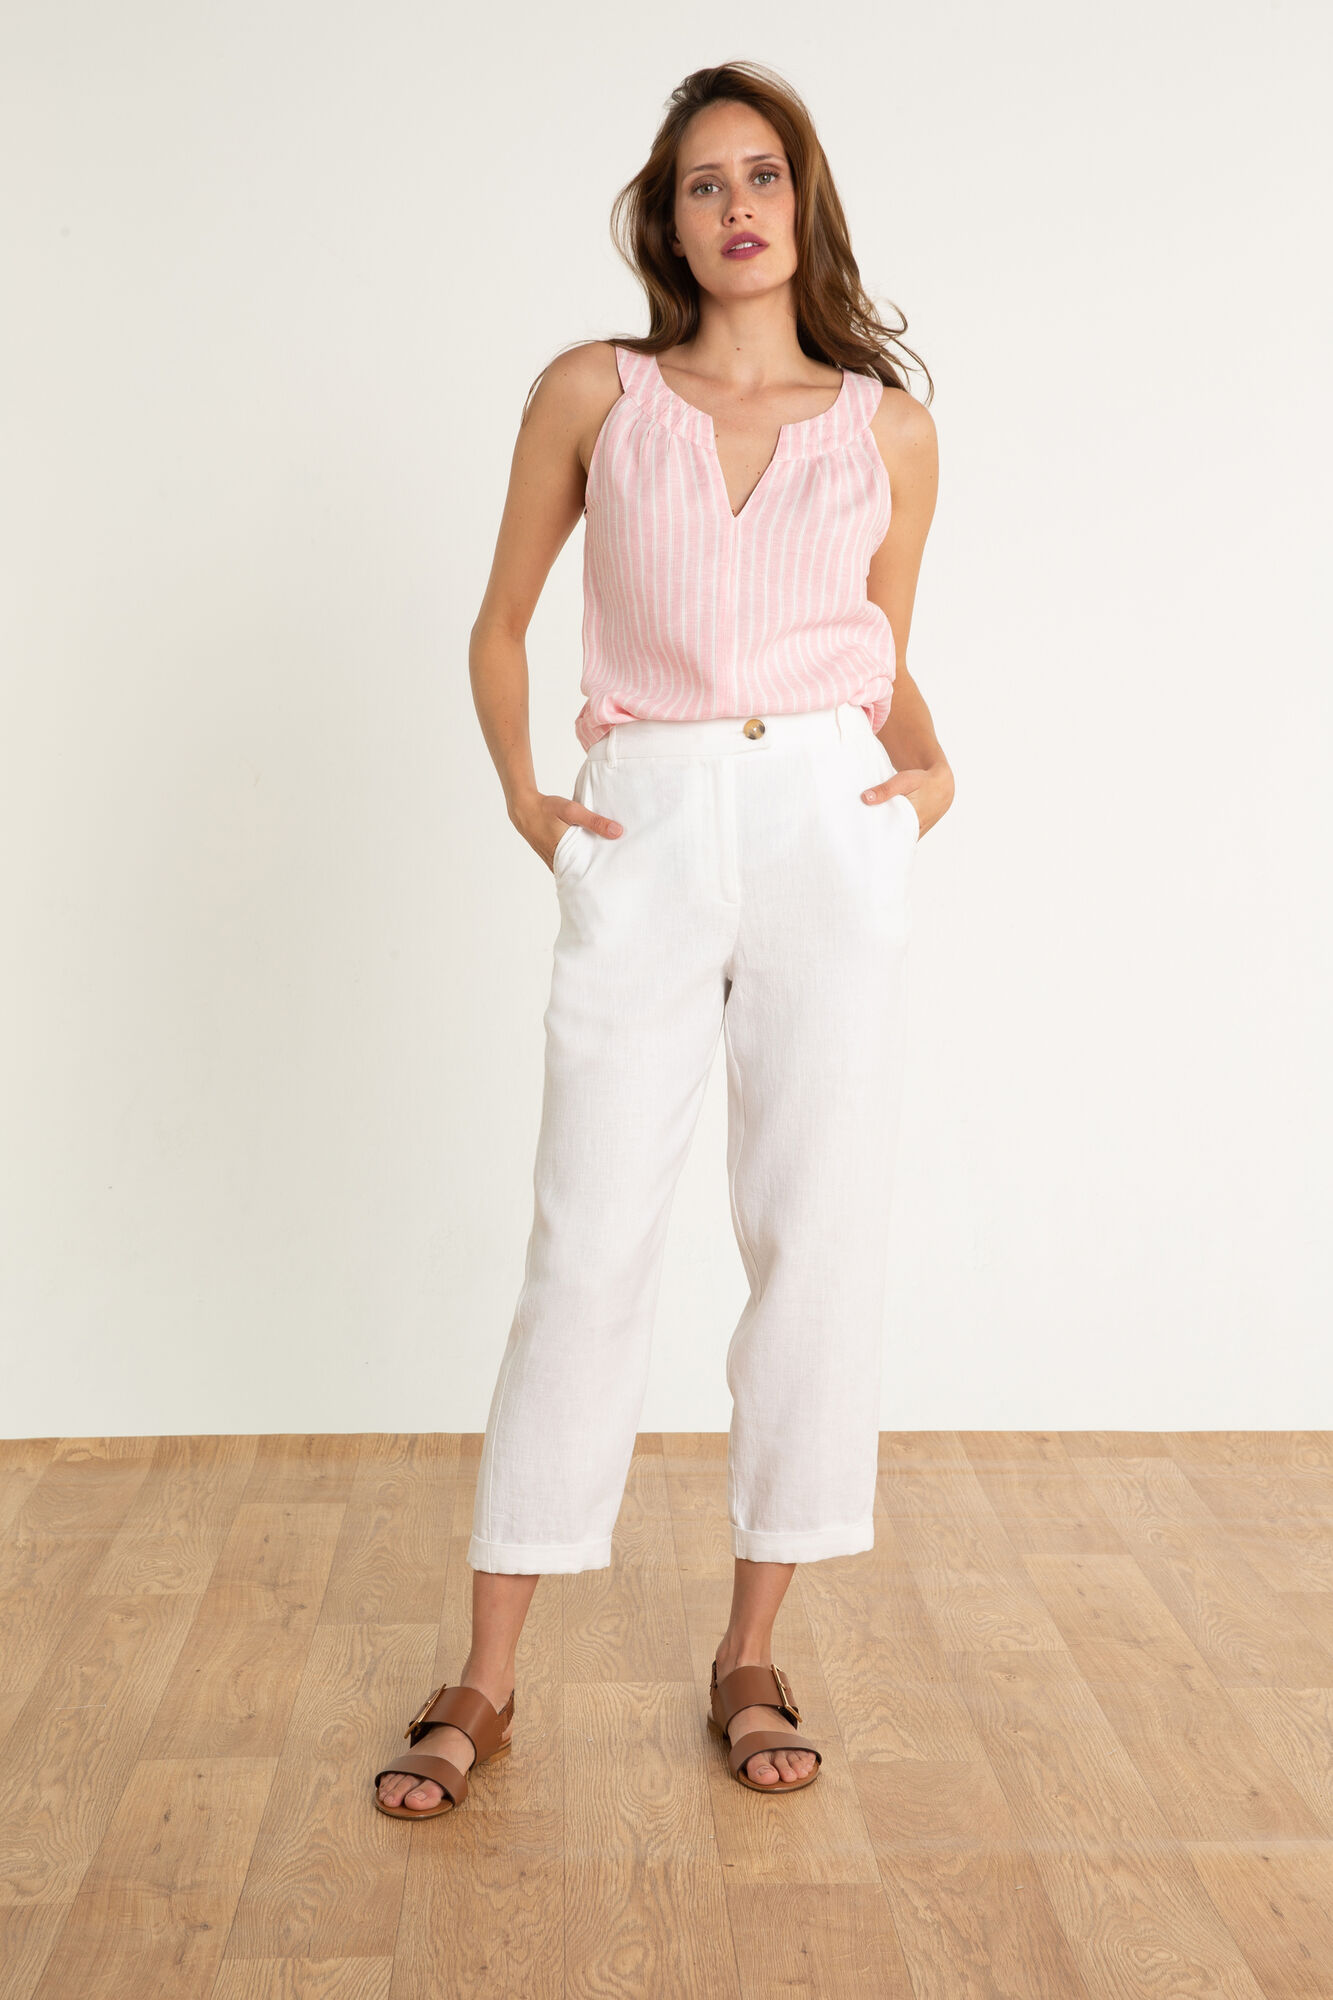 46c67b64b0503 Pantalon en lin Varadero : Pantalon femme Blanc en à 75.00 €